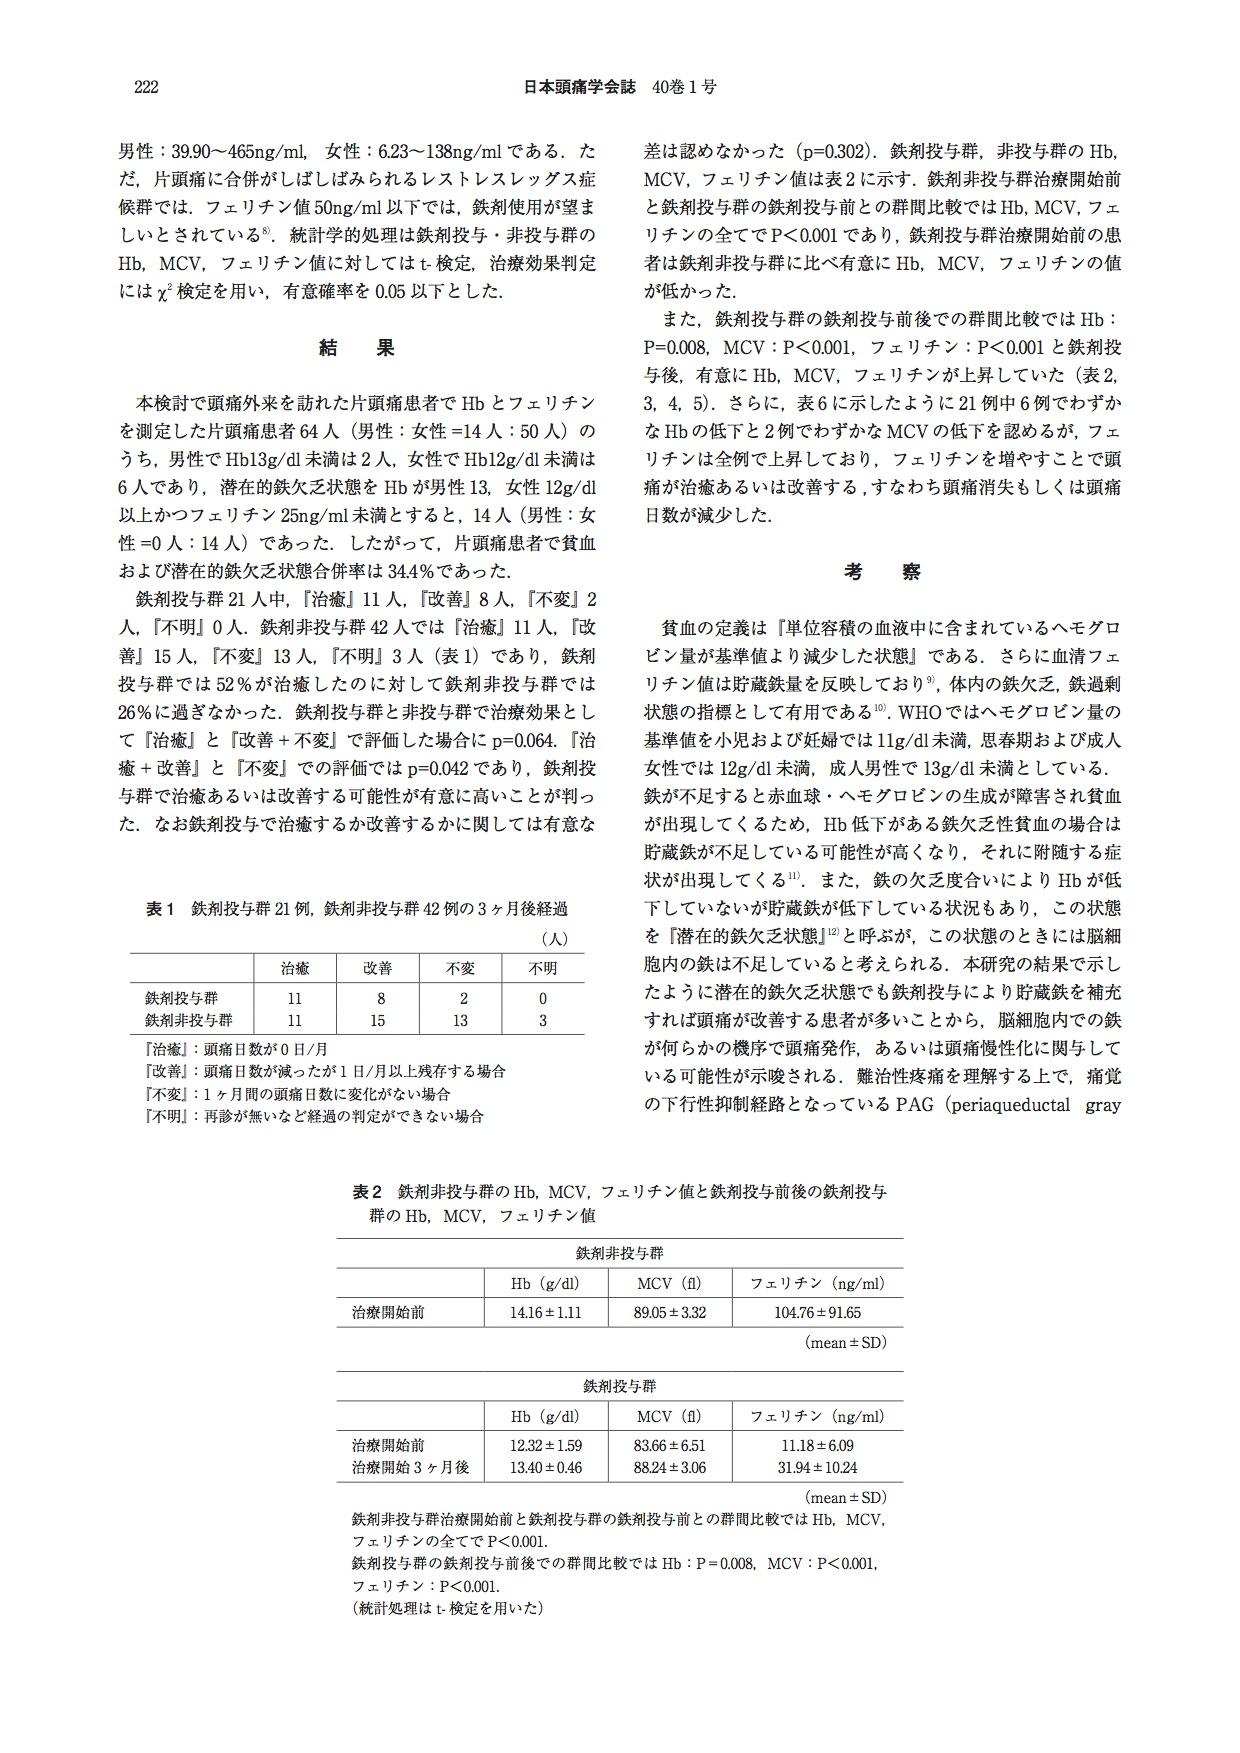 2013_40_no1.鉄剤投与pdf-2.jpg